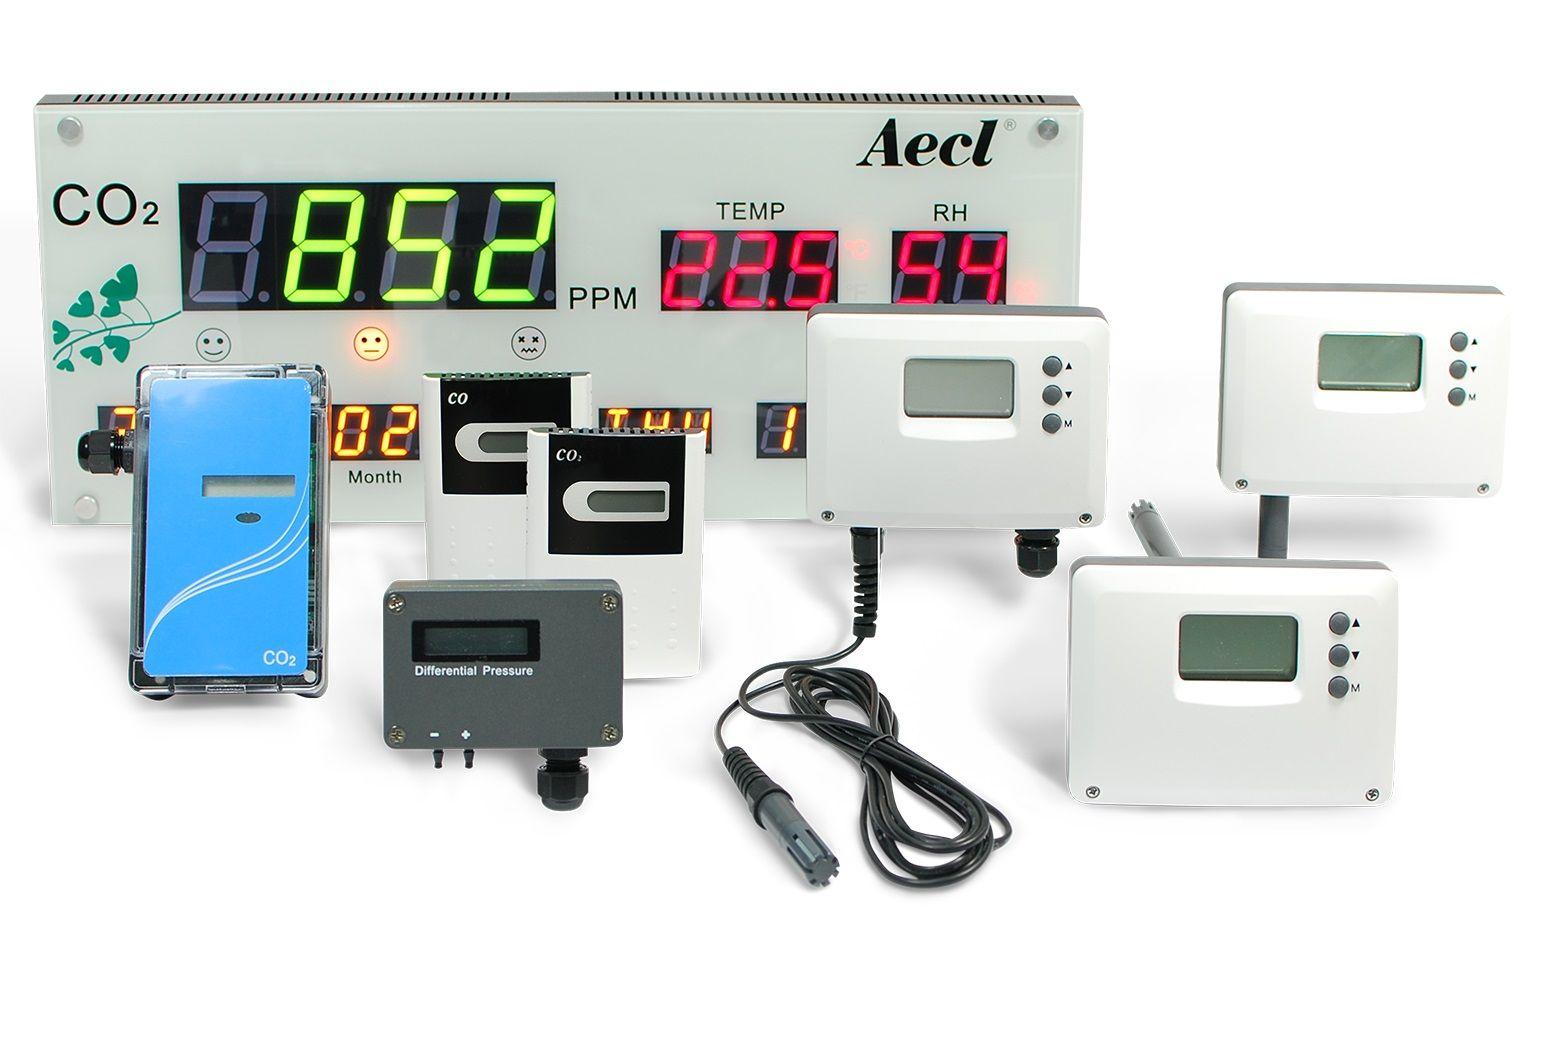 Dispositivos para monitoramento e controle ambiental